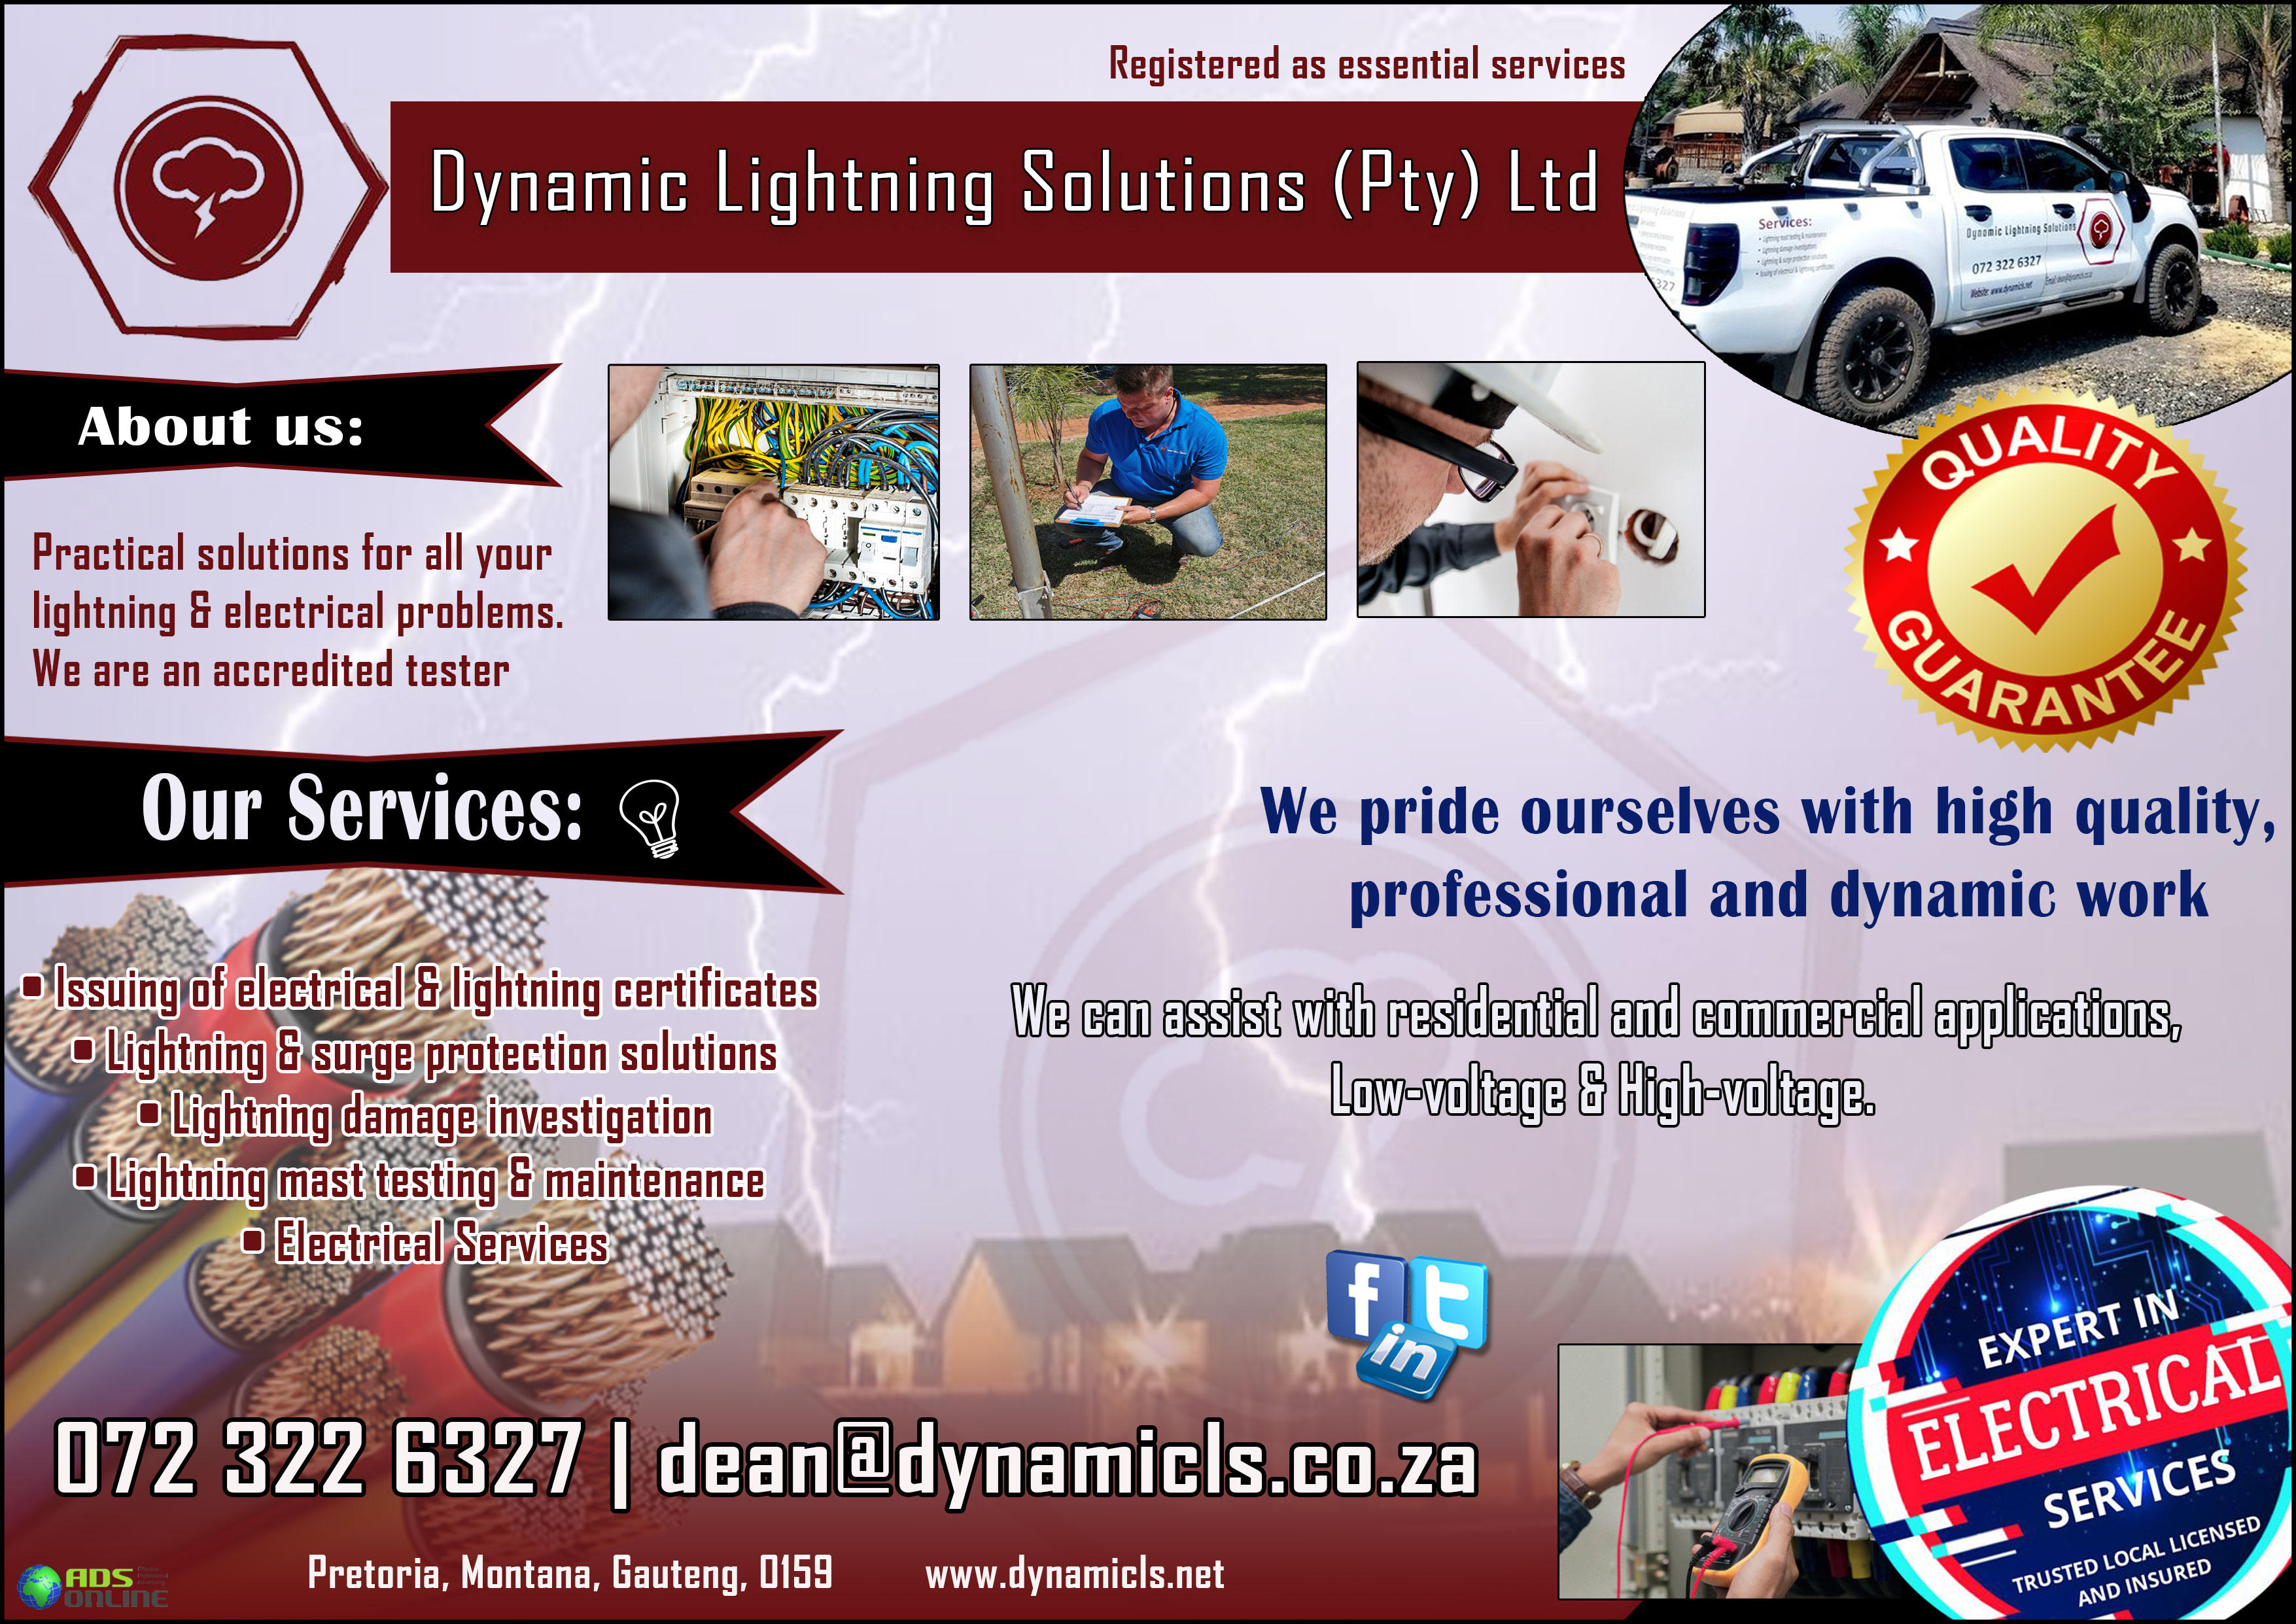 Dynamic Lightning Solutions (Pty) Ltd | Pretoria, Montana, Gauteng